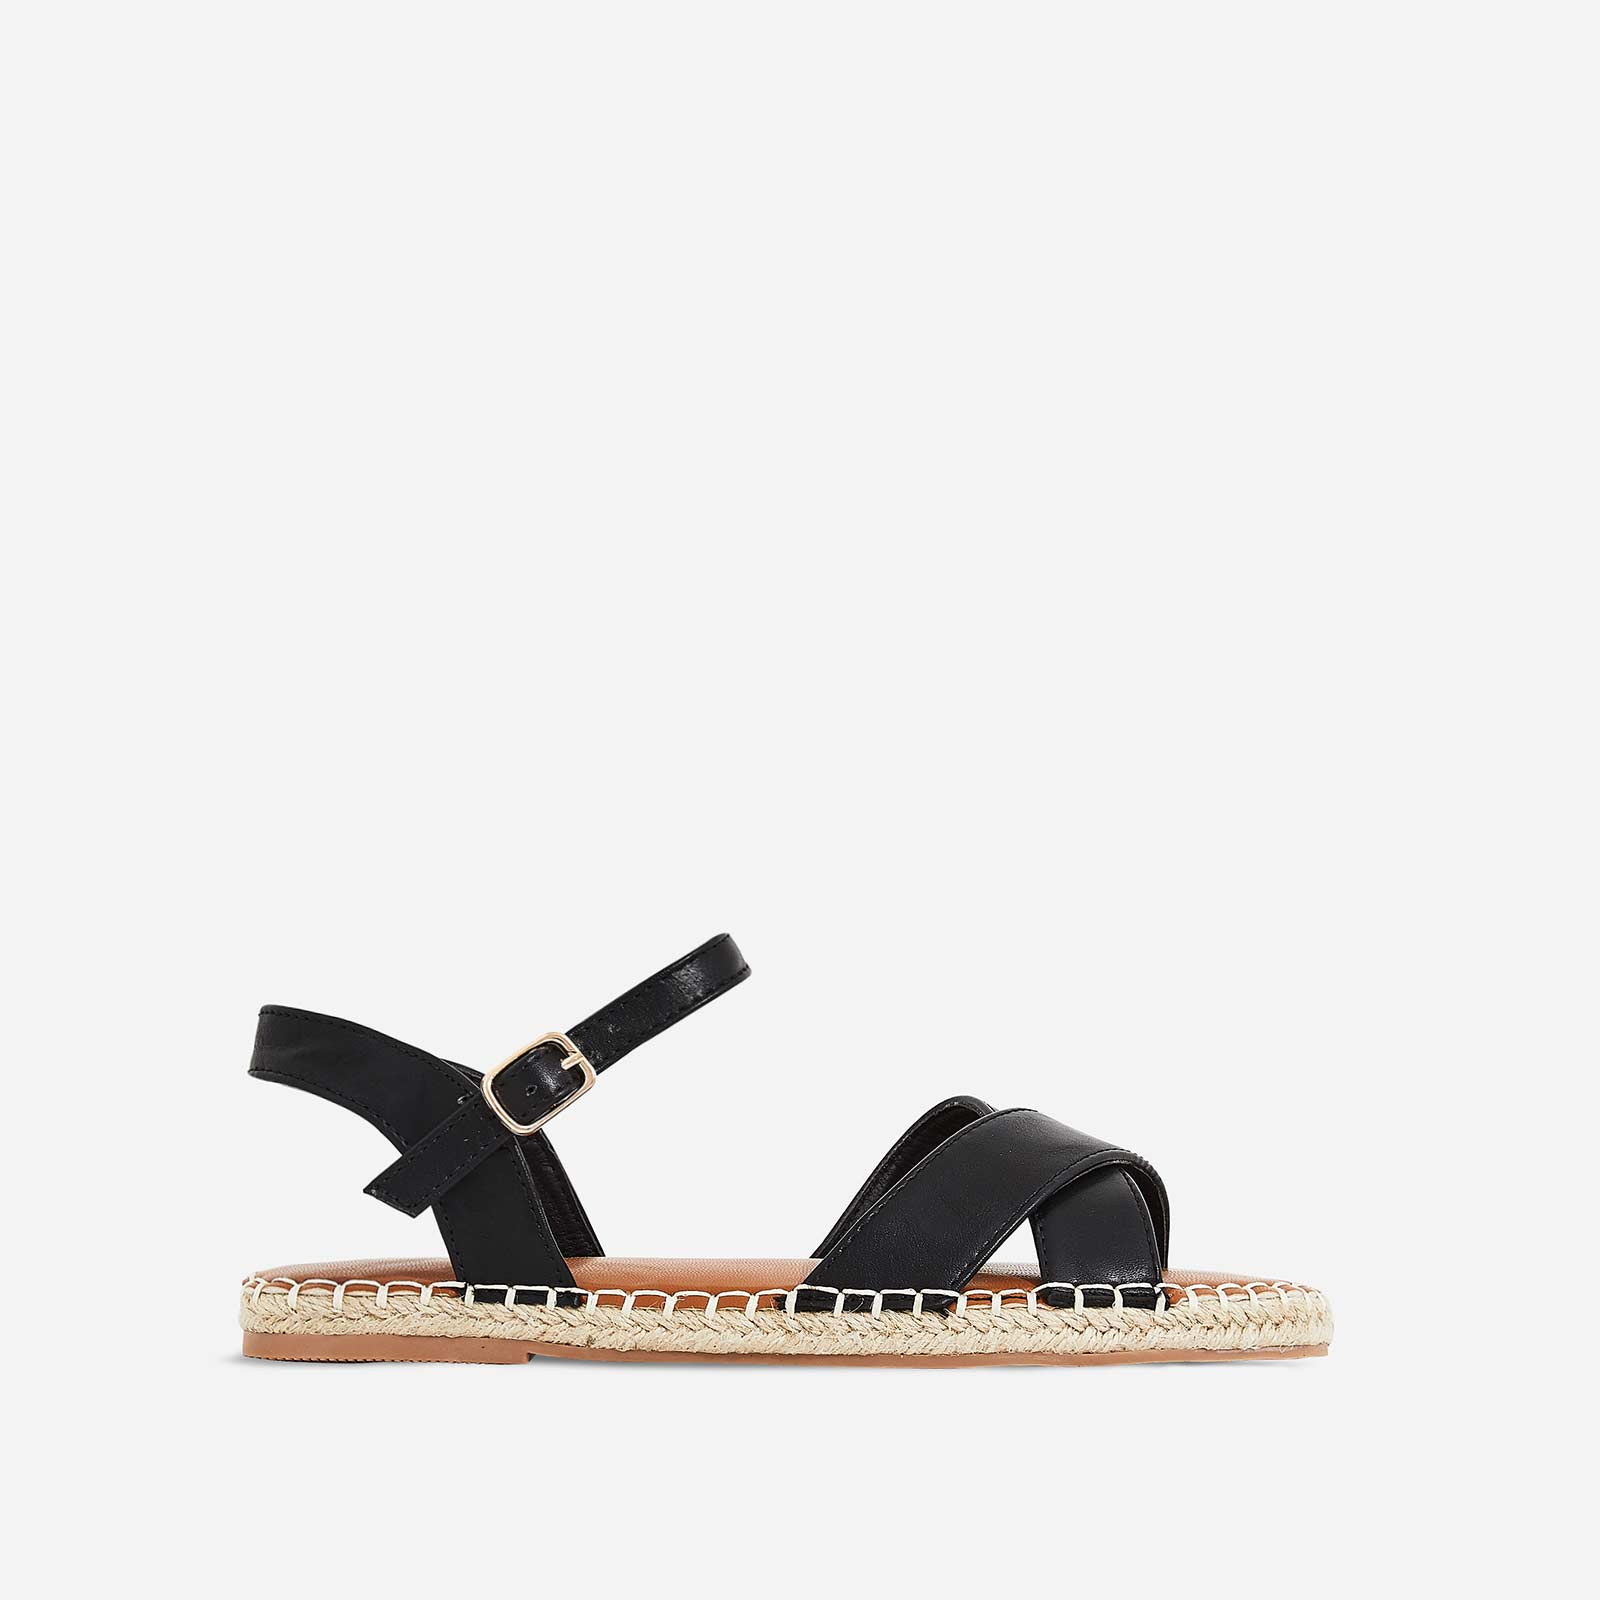 Mirren Espadrille Flat Sandal In Black Faux Leather